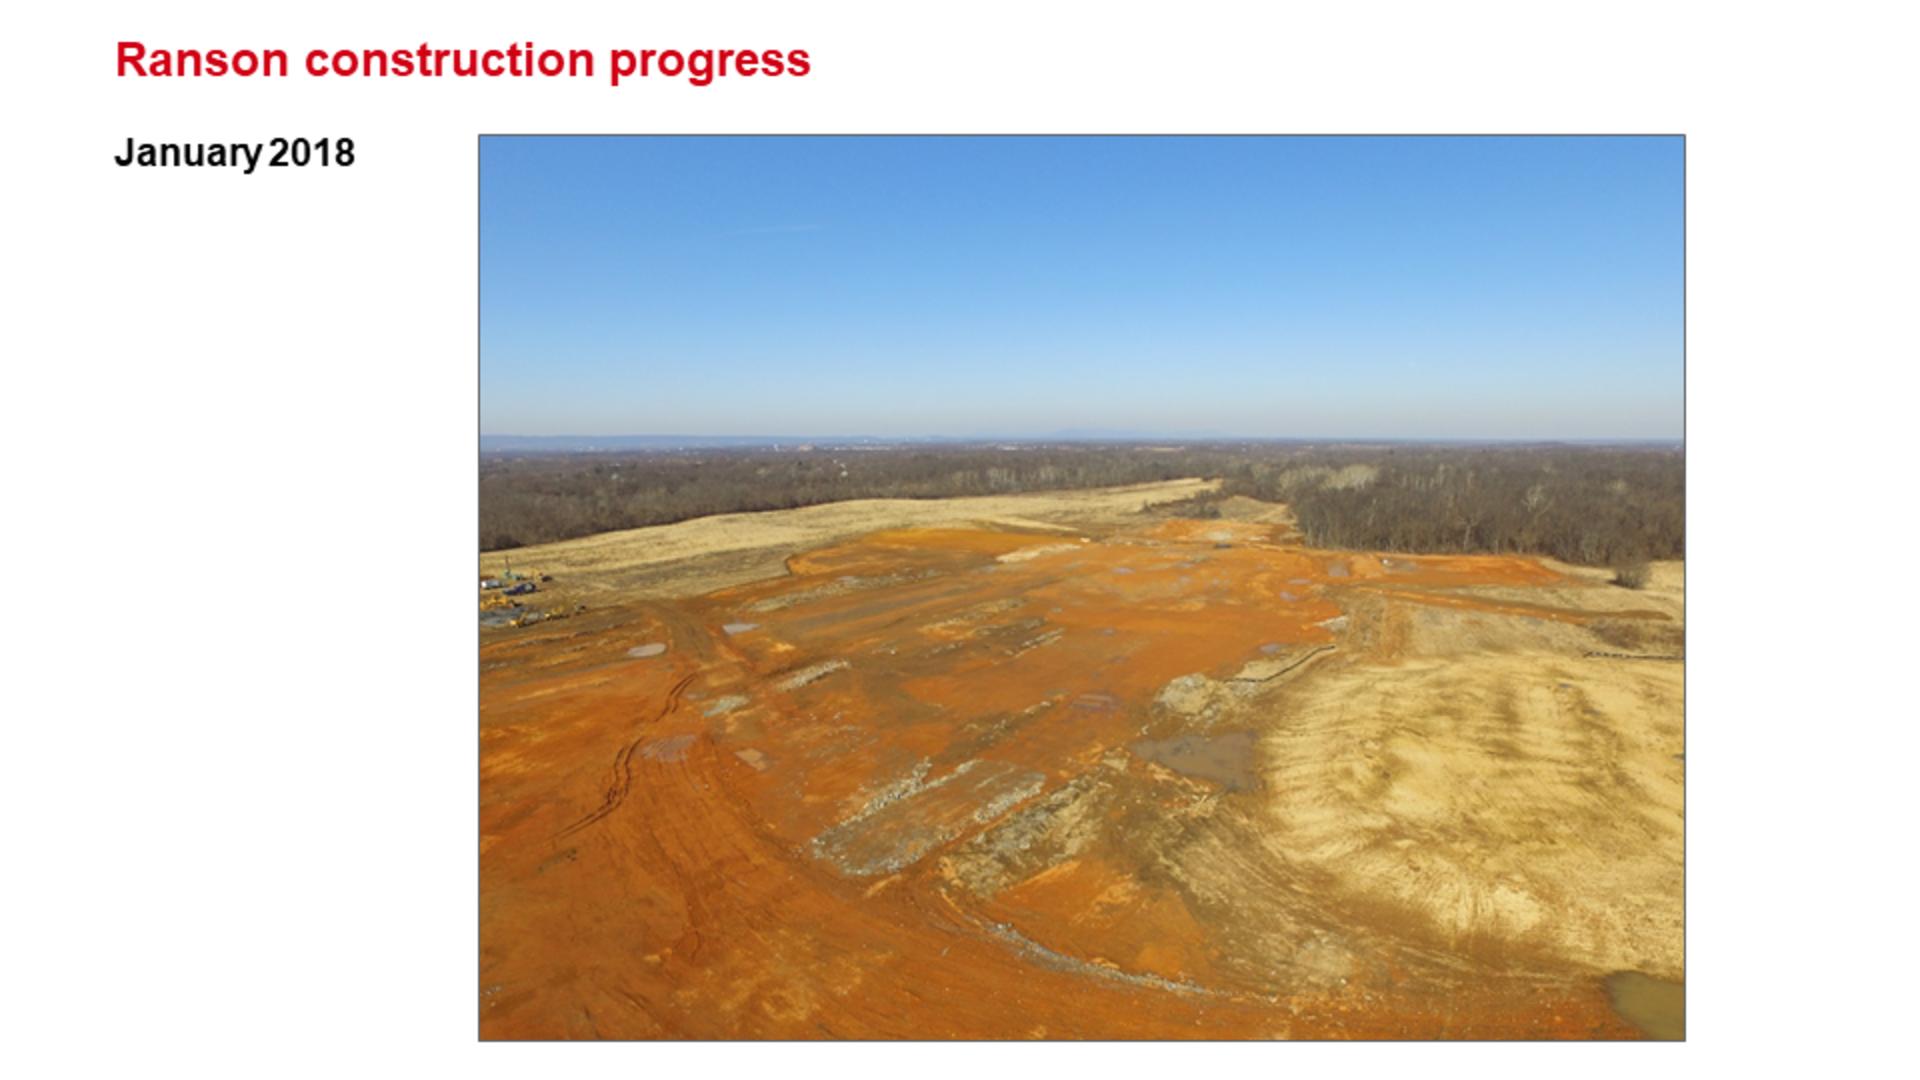 ROCKWOOL Ranson (Jefferson County) WV Construction Progress January 2018.